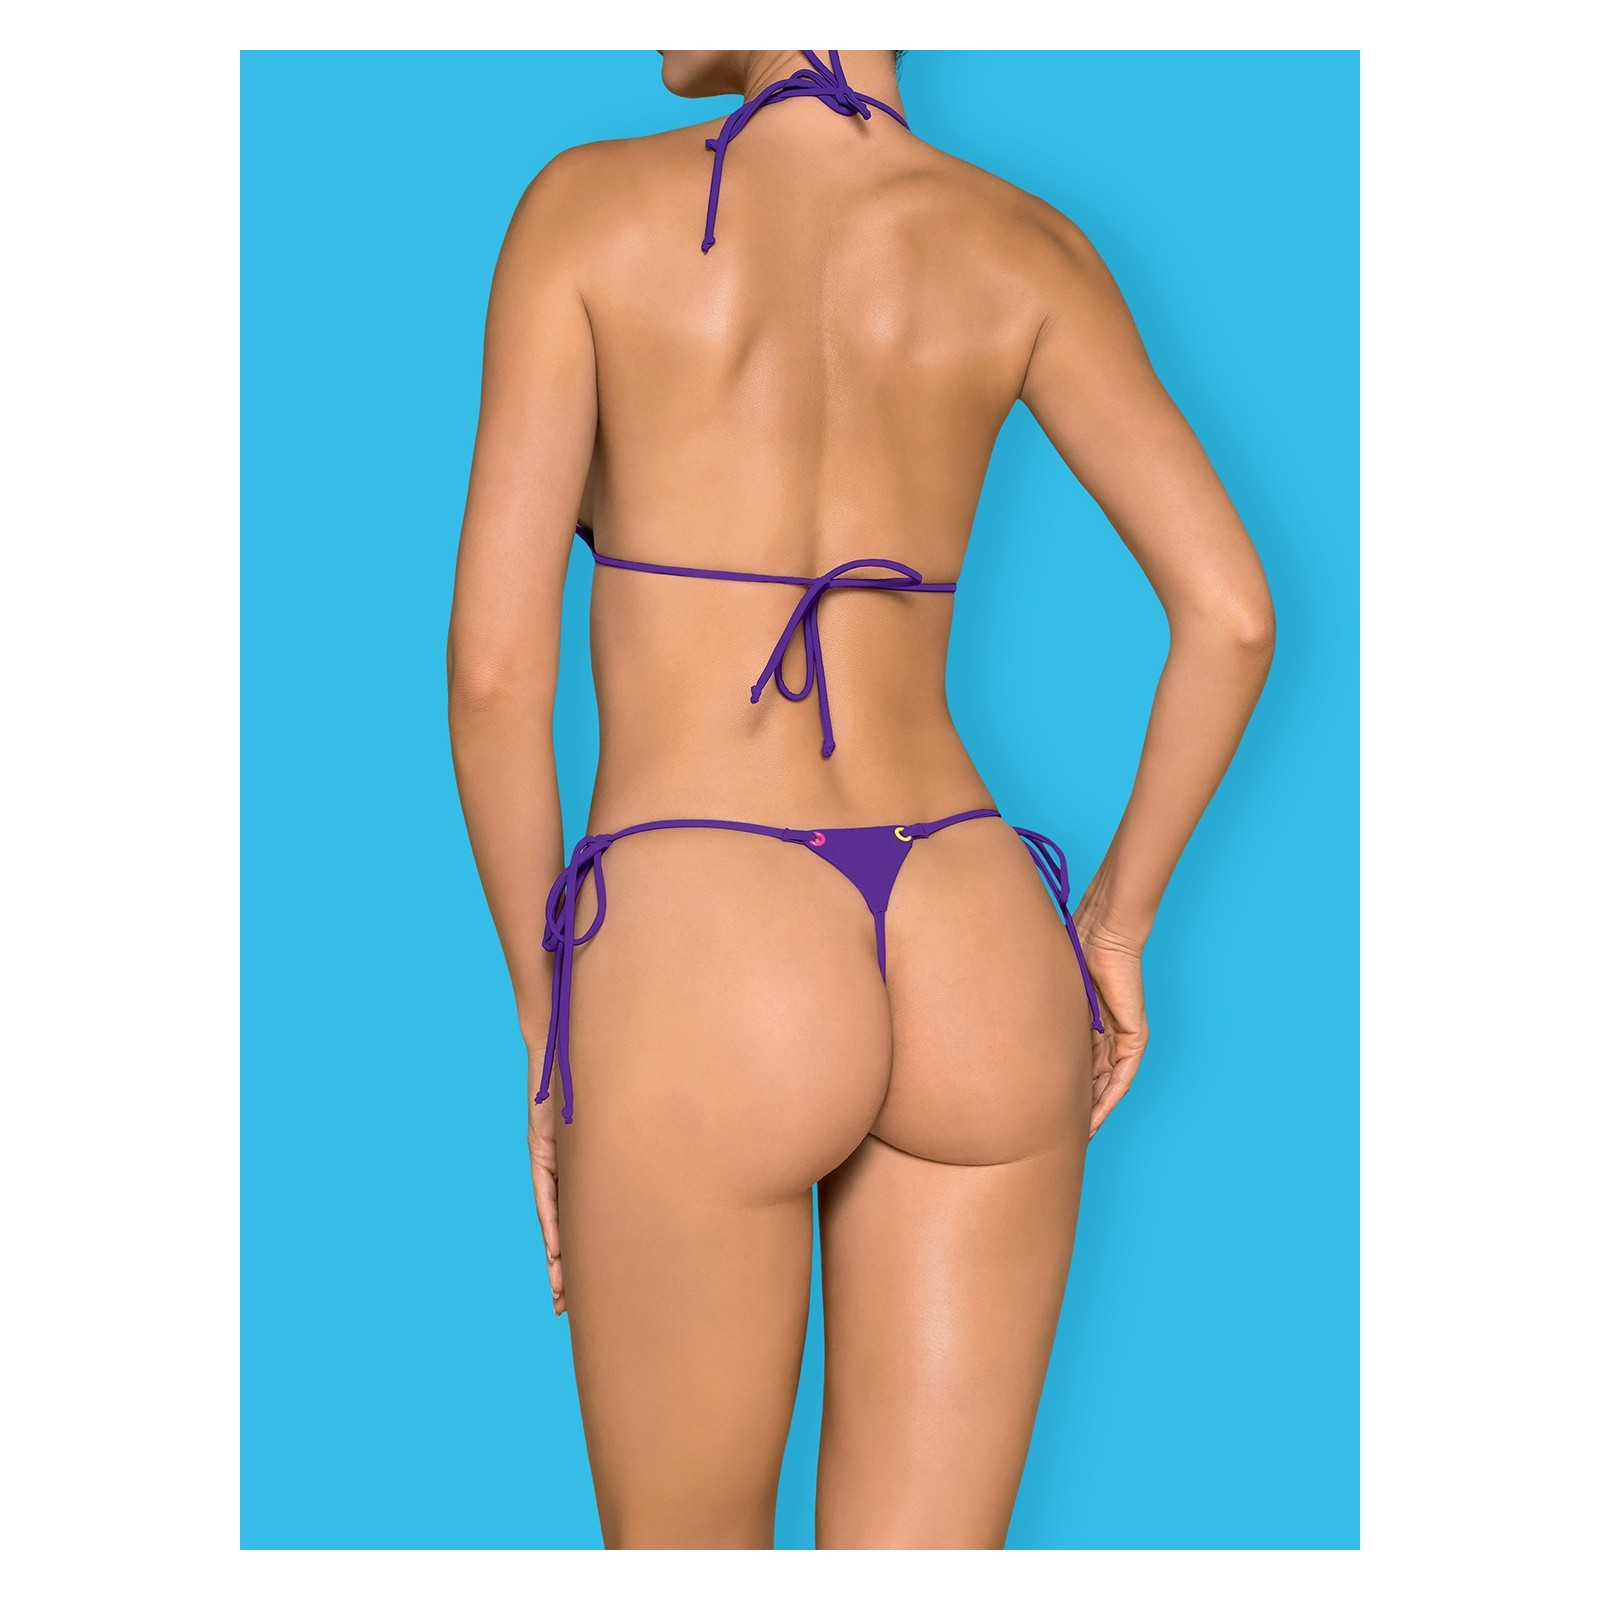 Micro-Bikini Beverelle violett - 2 - Vorschaubild